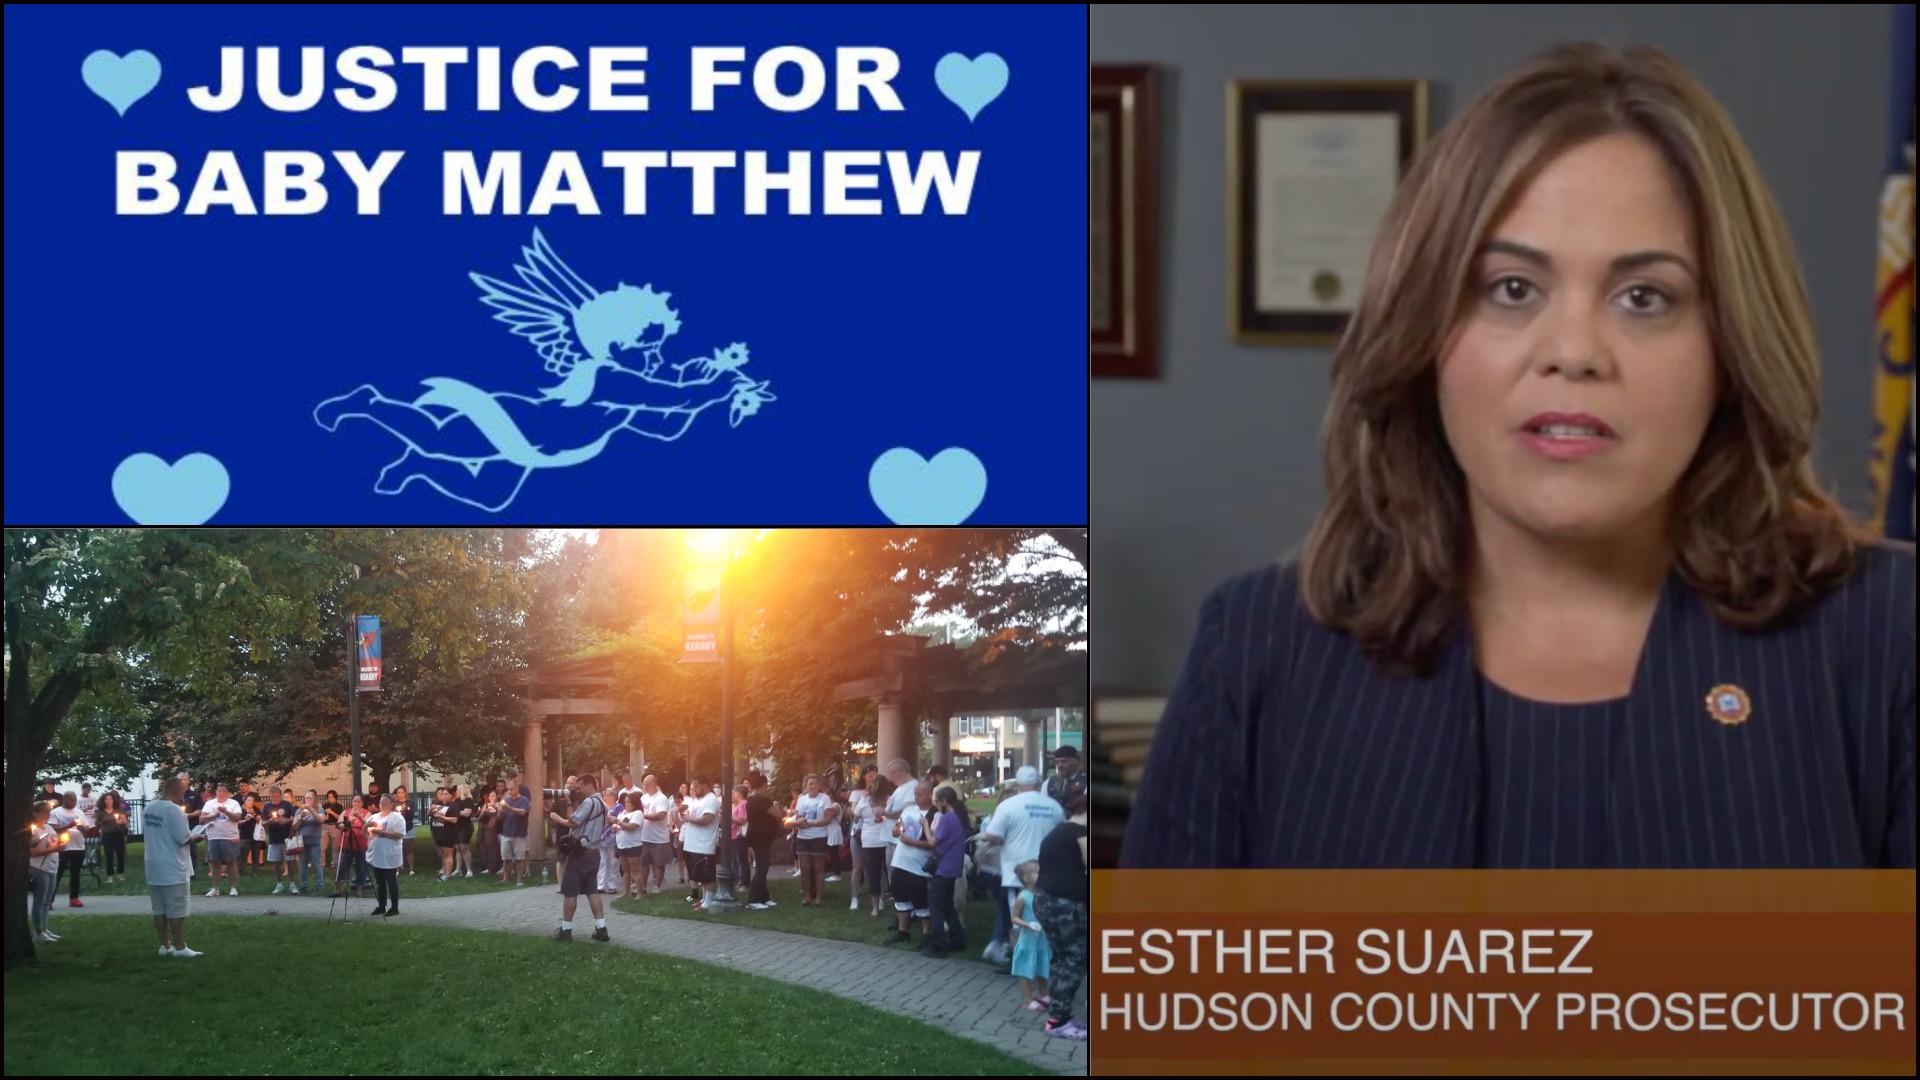 Justice for Baby Matthew - Kearny, NJ - Hudson County Prosecutor Esther Suarez